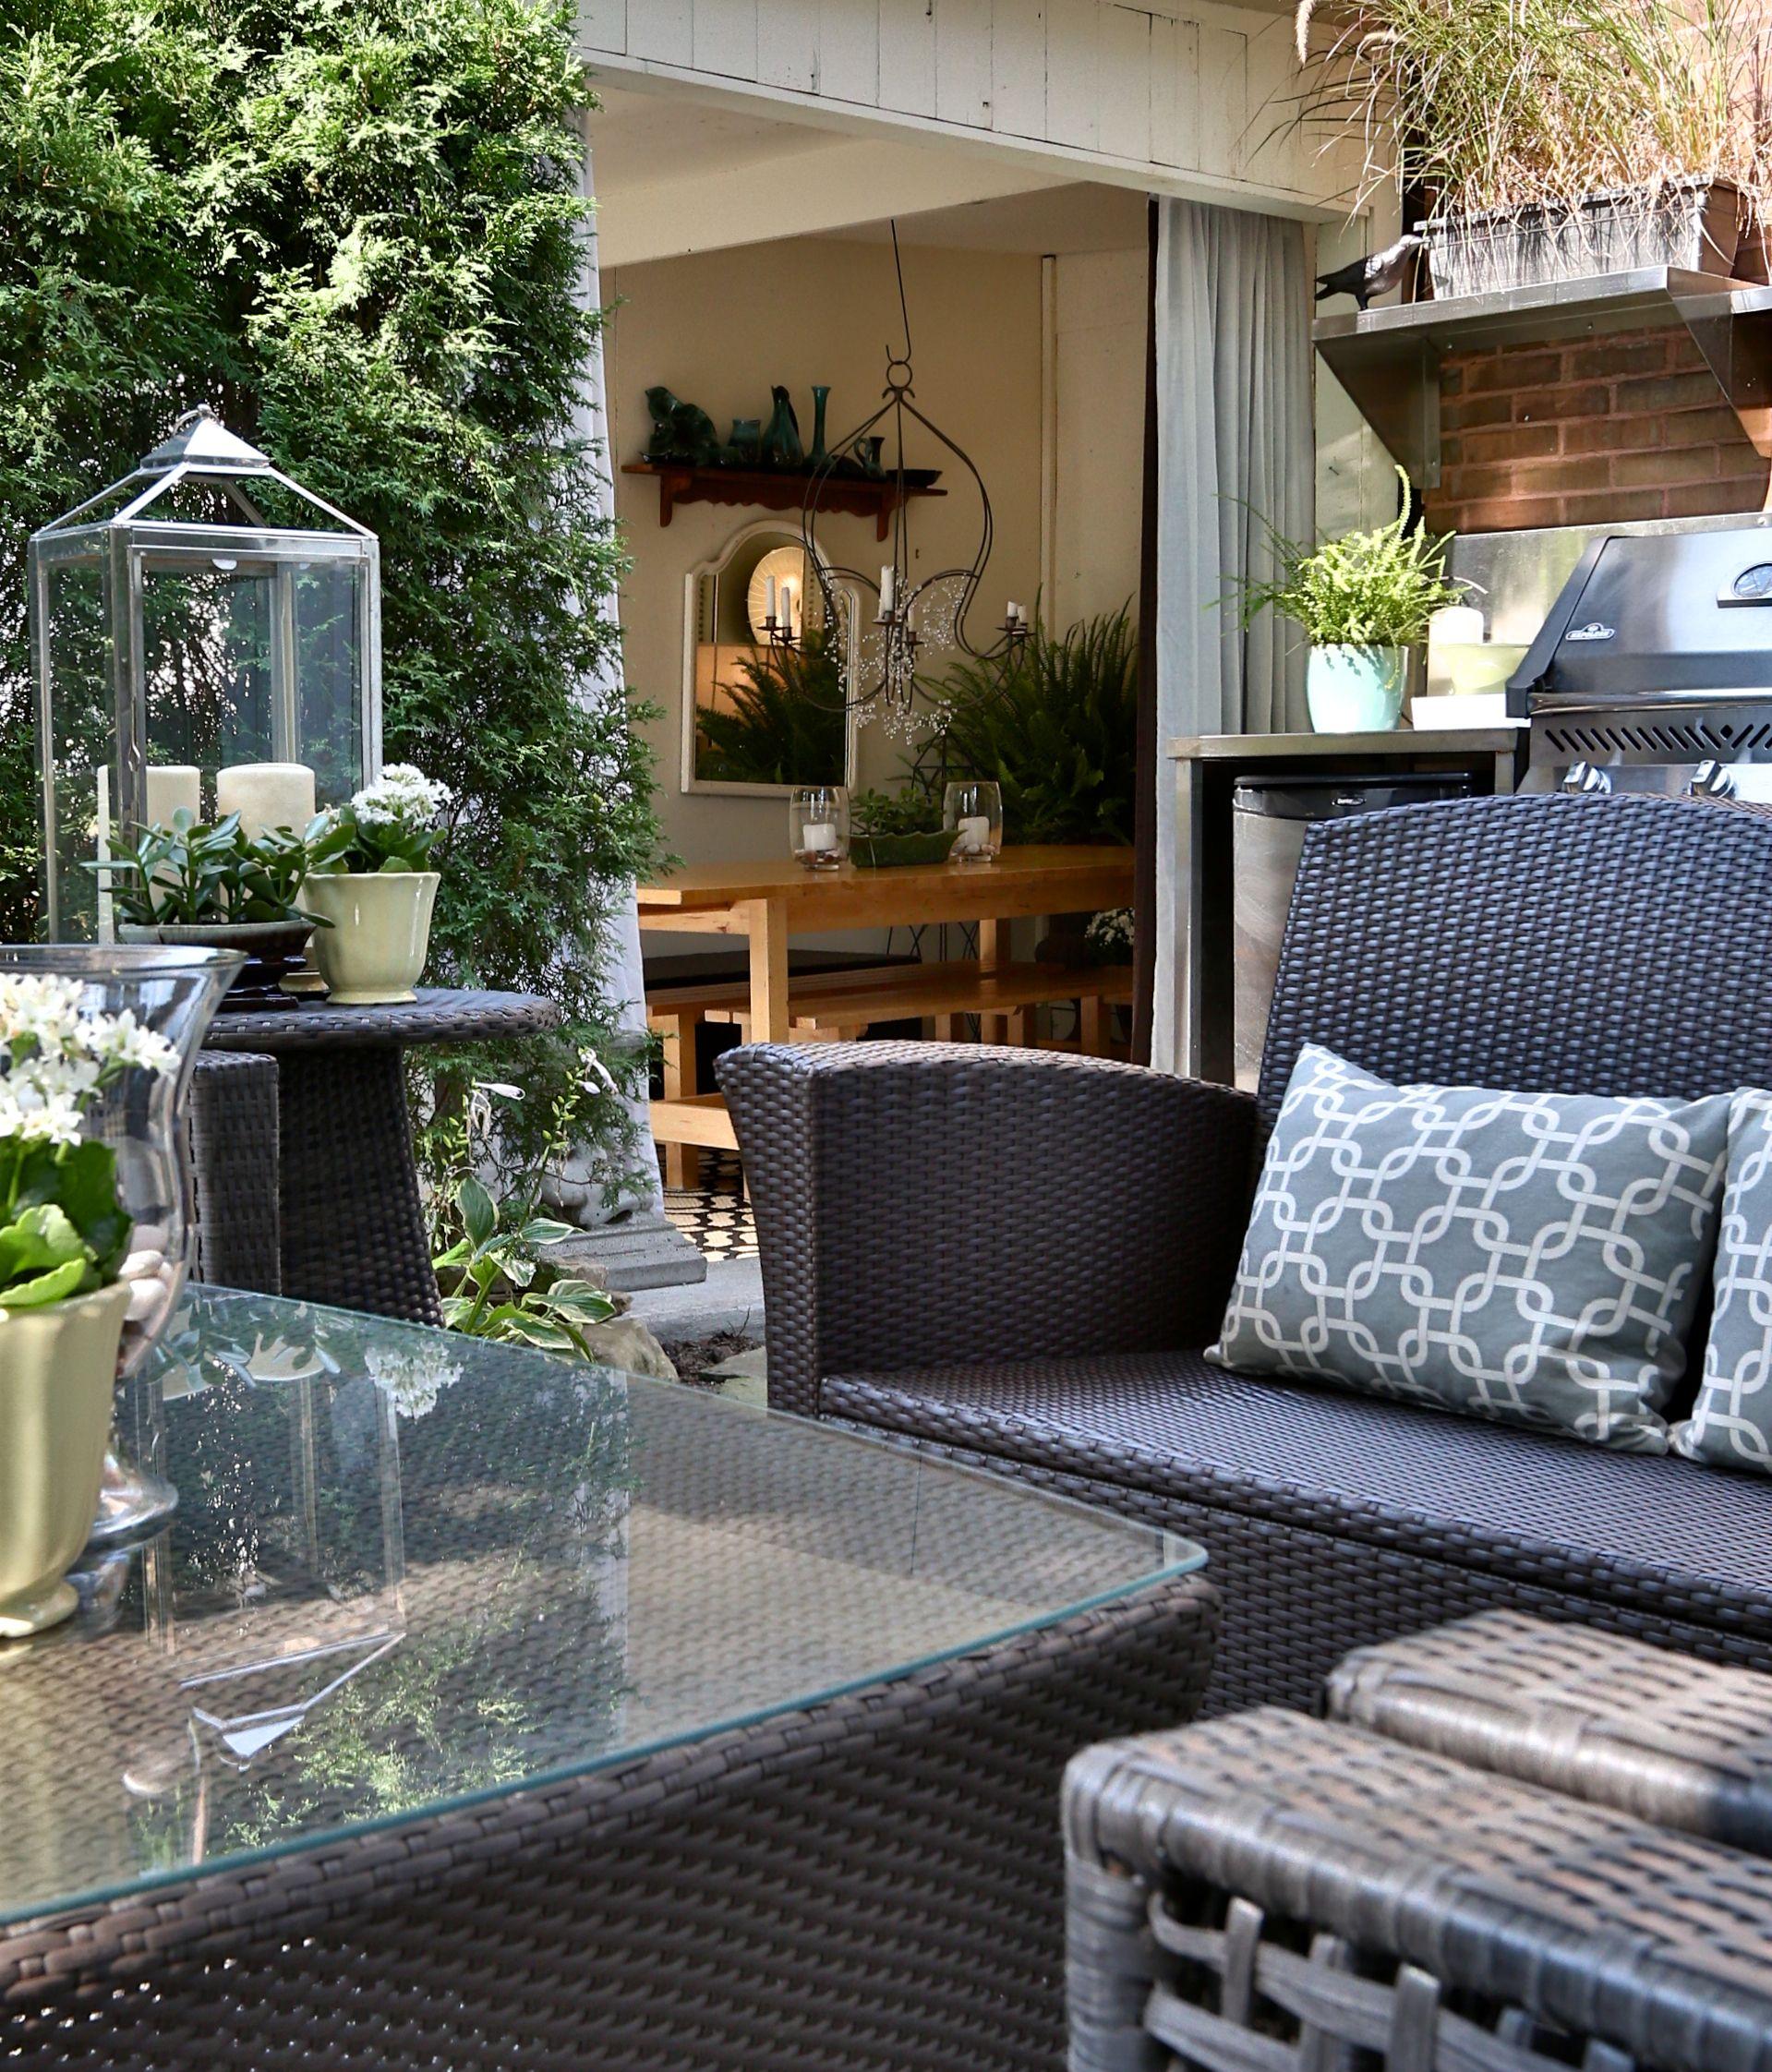 Interior Design Home Staging: Home Staging, Decoration & Interior